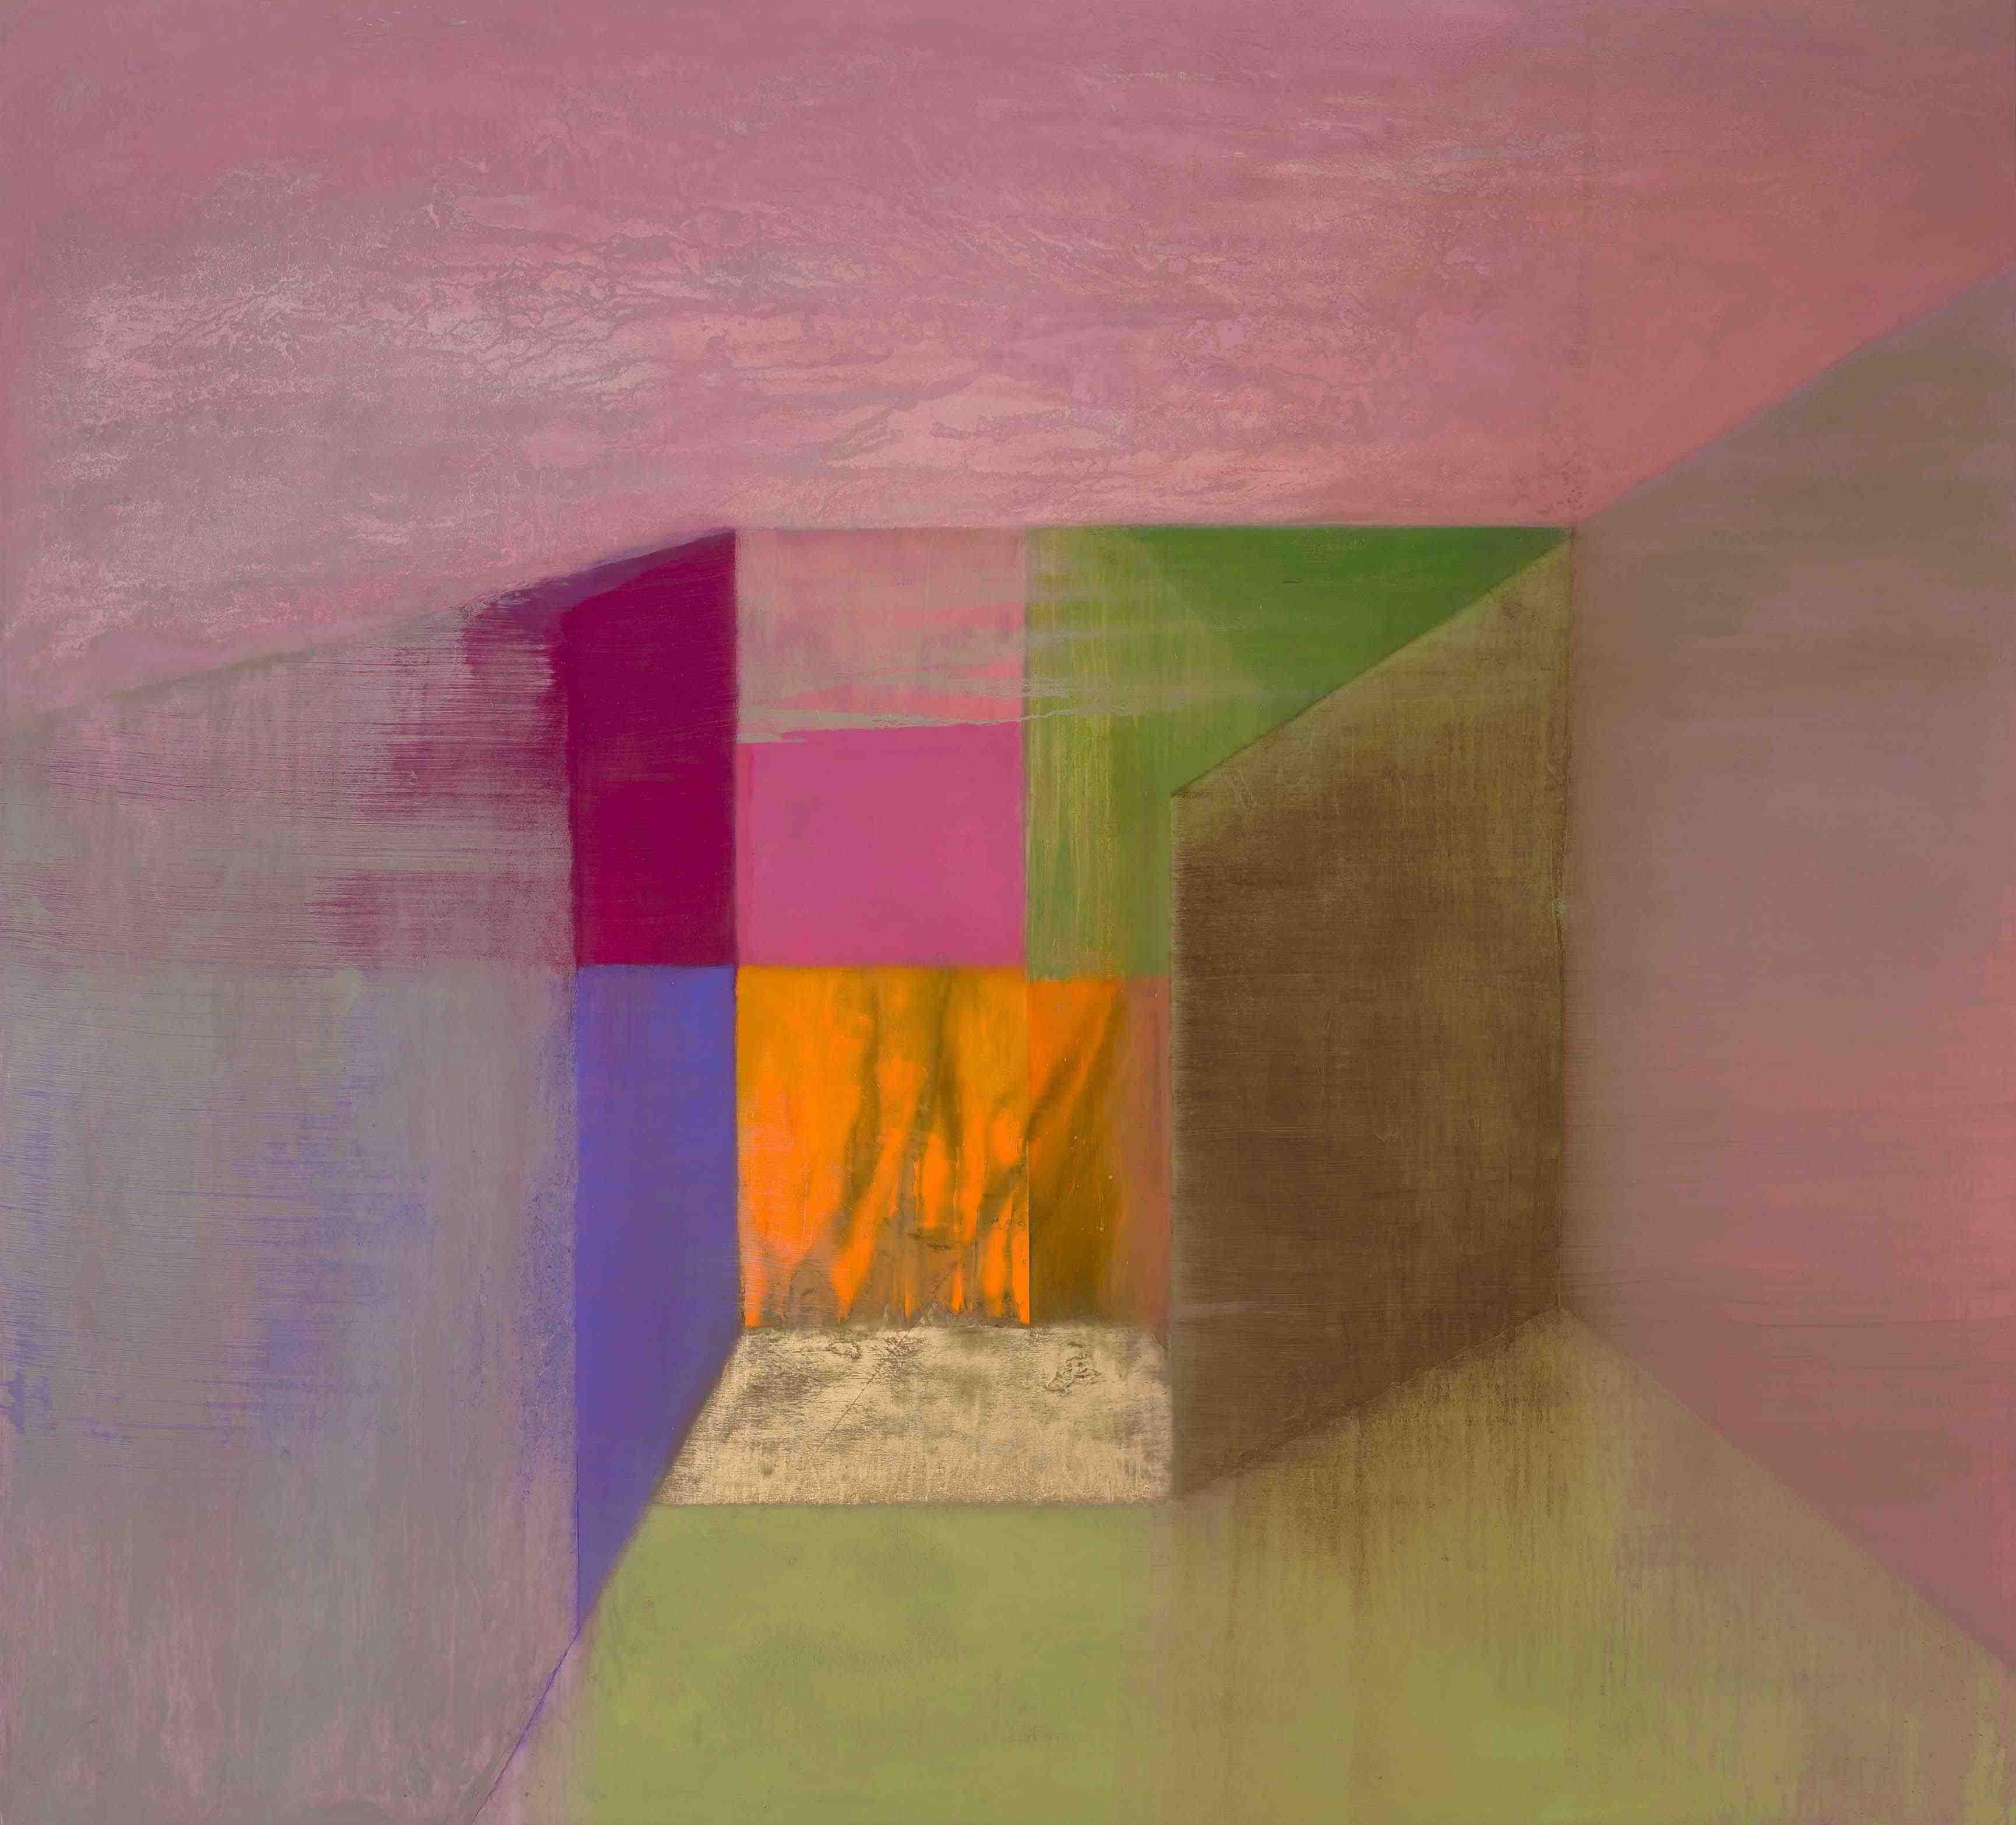 Tom Climent, Heart Box, oil & plaster on canvas, 183 x 164 cm